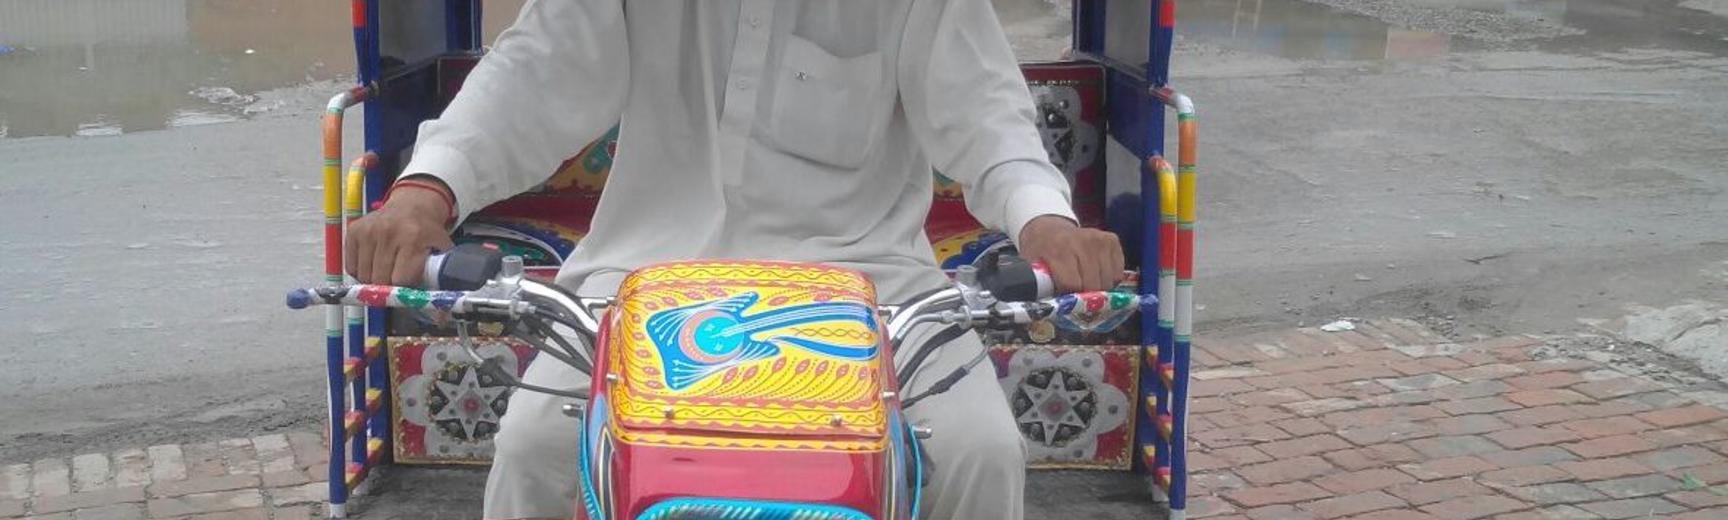 Man in Rickshaw in Lahore